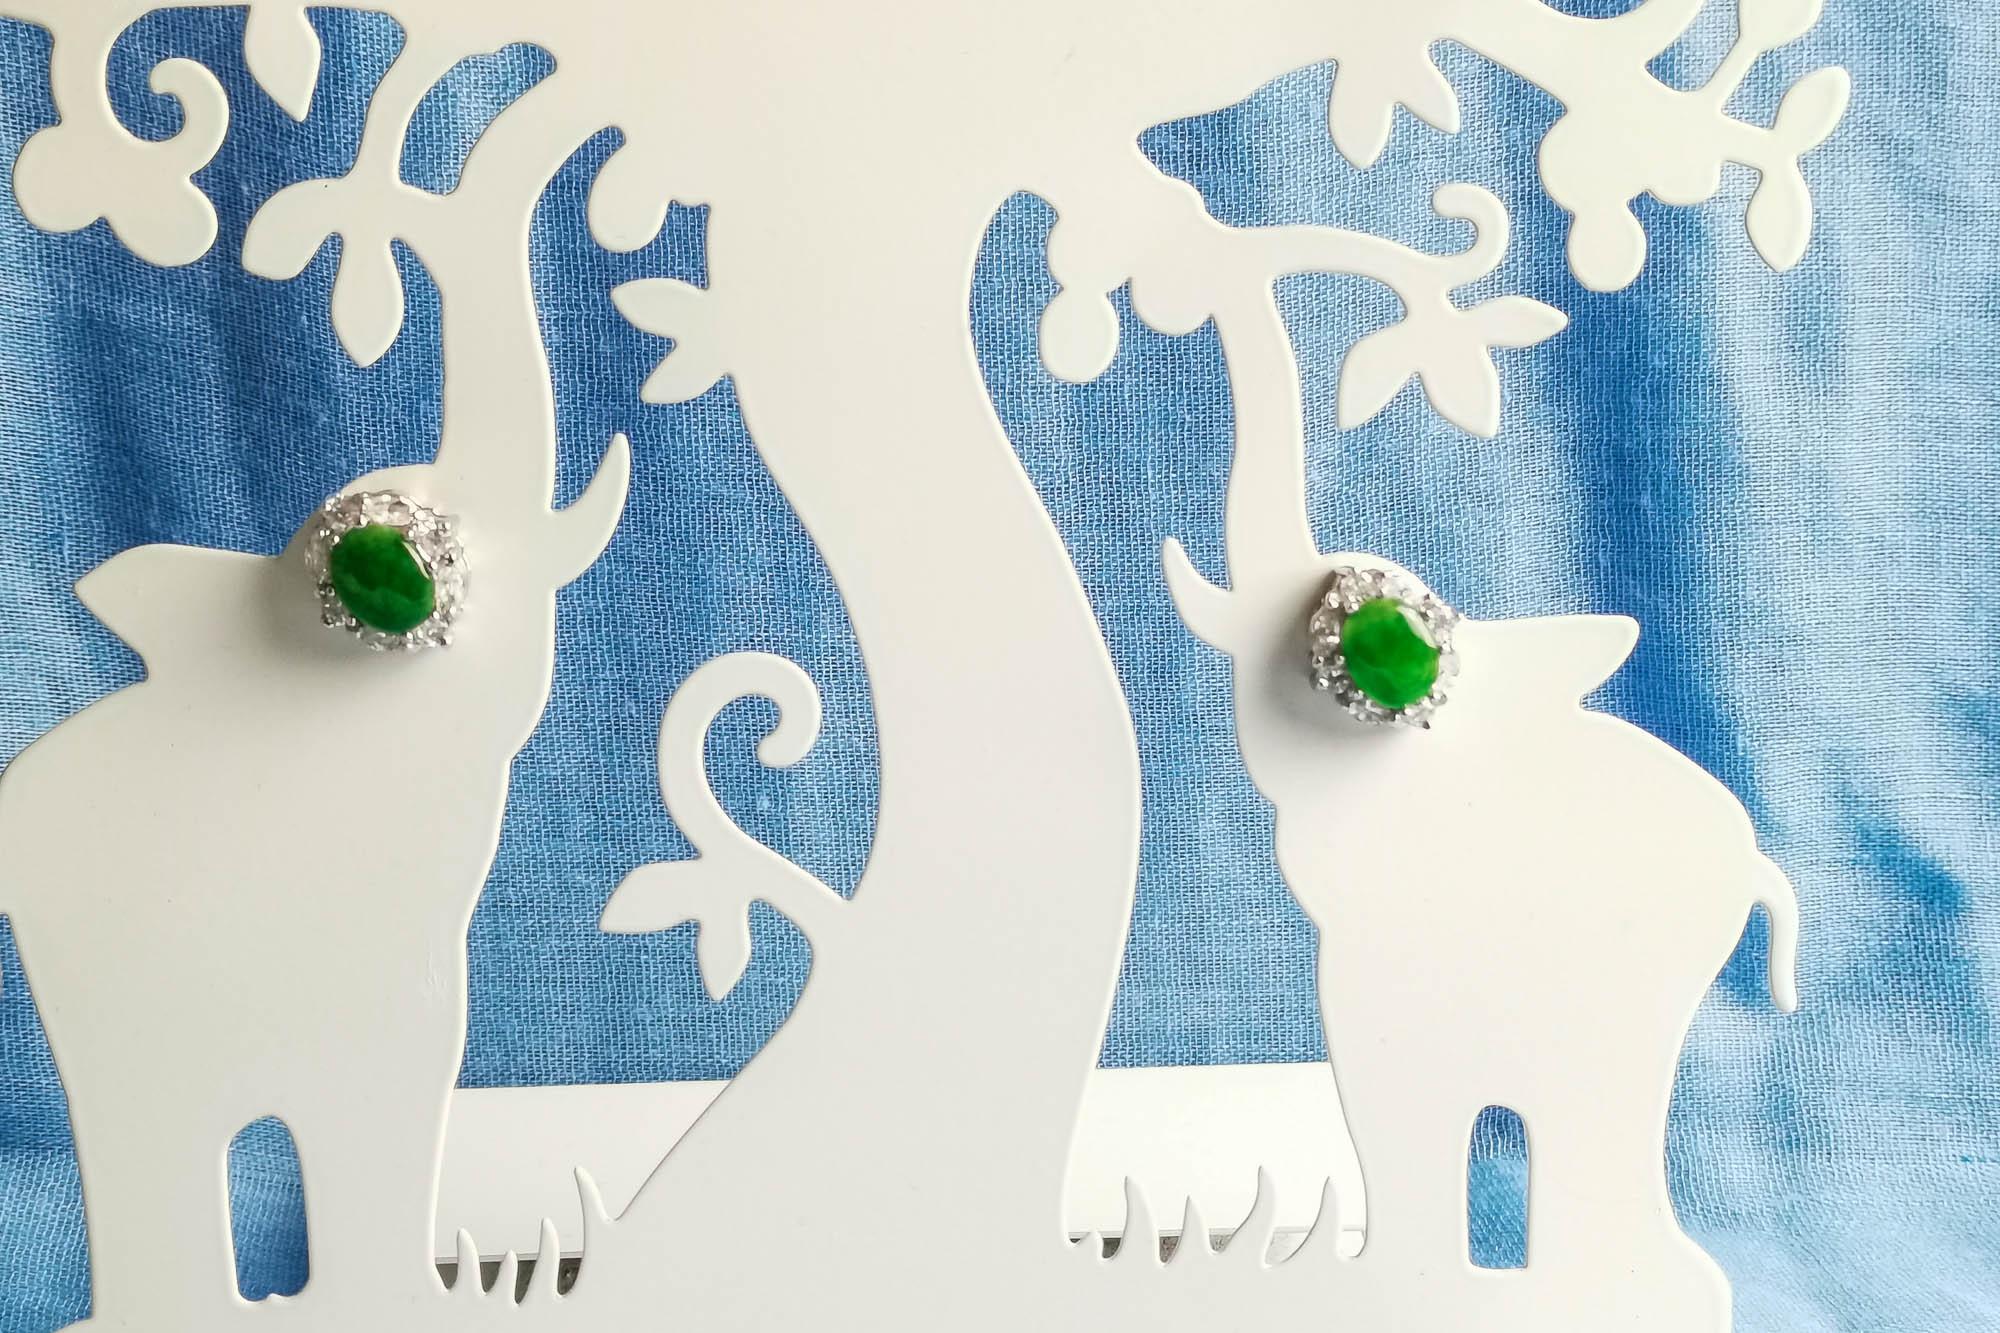 small green rhinestone earrings